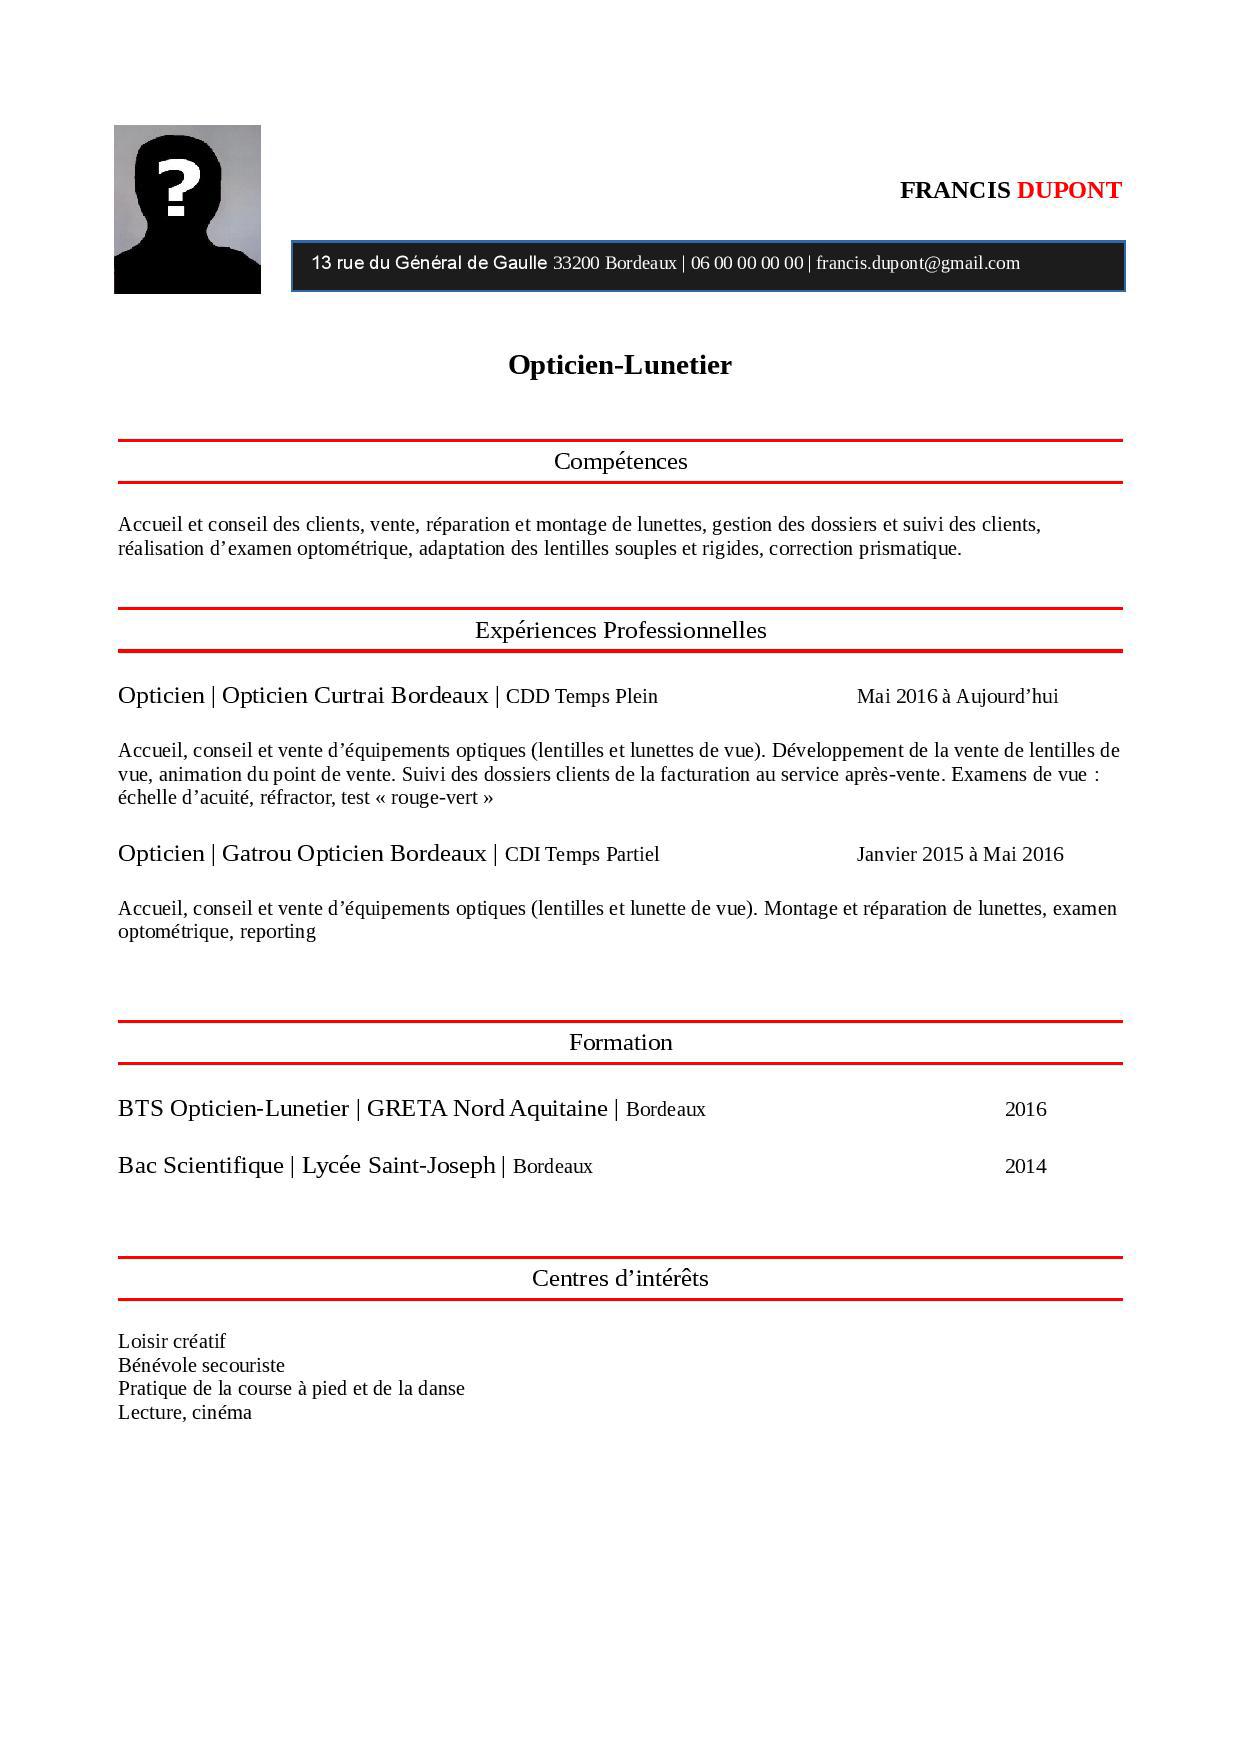 Modele Exemple De Cv Opticien Lunetier Staffsante